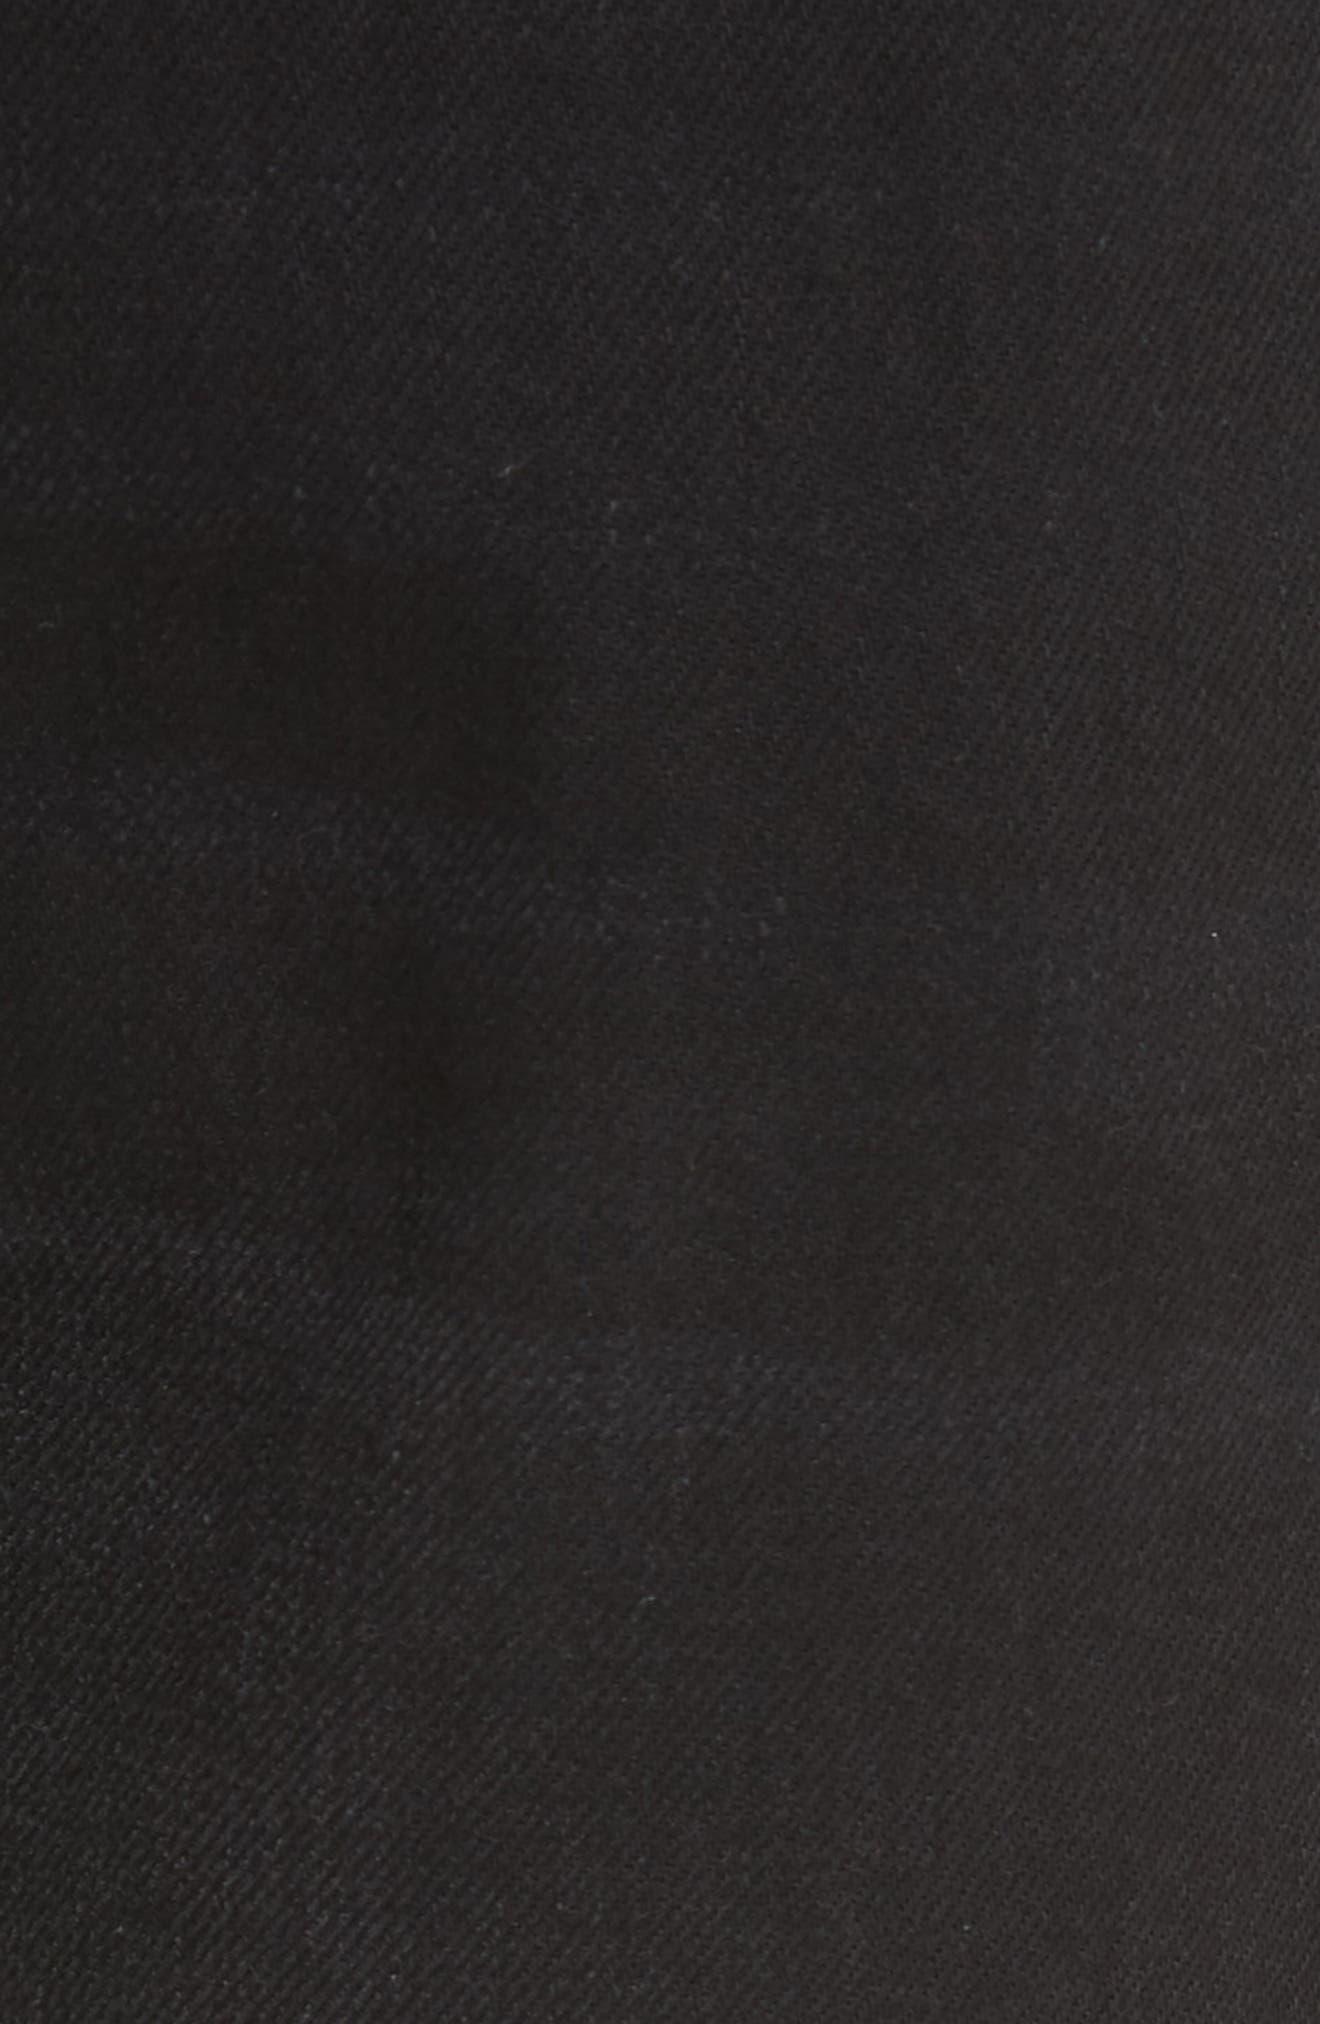 Le Original Released Hem High Waist Jeans,                             Alternate thumbnail 5, color,                             001